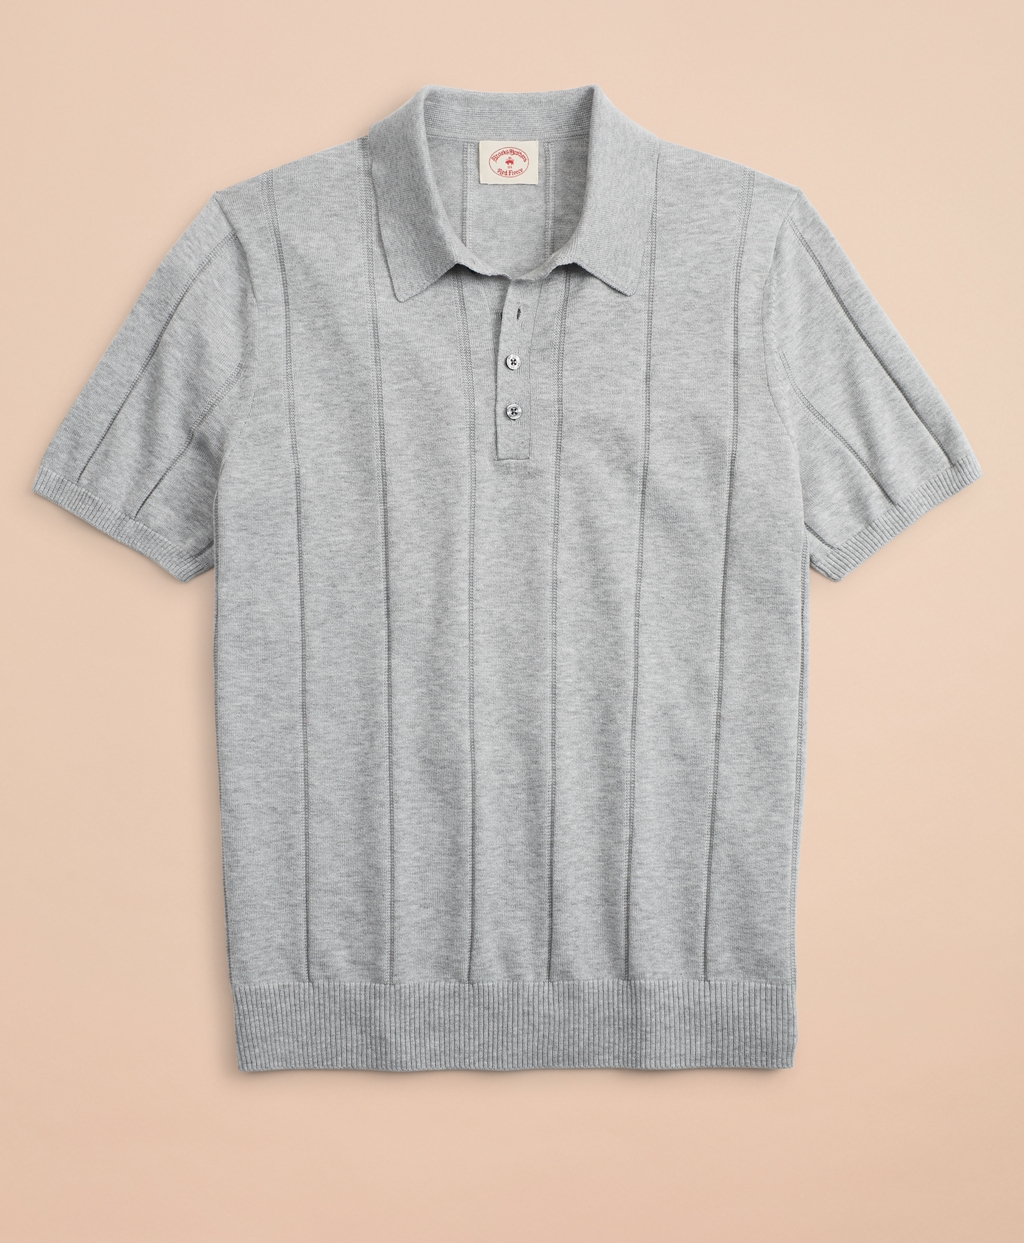 Vintage Shirts – Mens – Retro Shirts Brooks Brothers Mens Striped Cotton Sweater Polo $59.50 AT vintagedancer.com